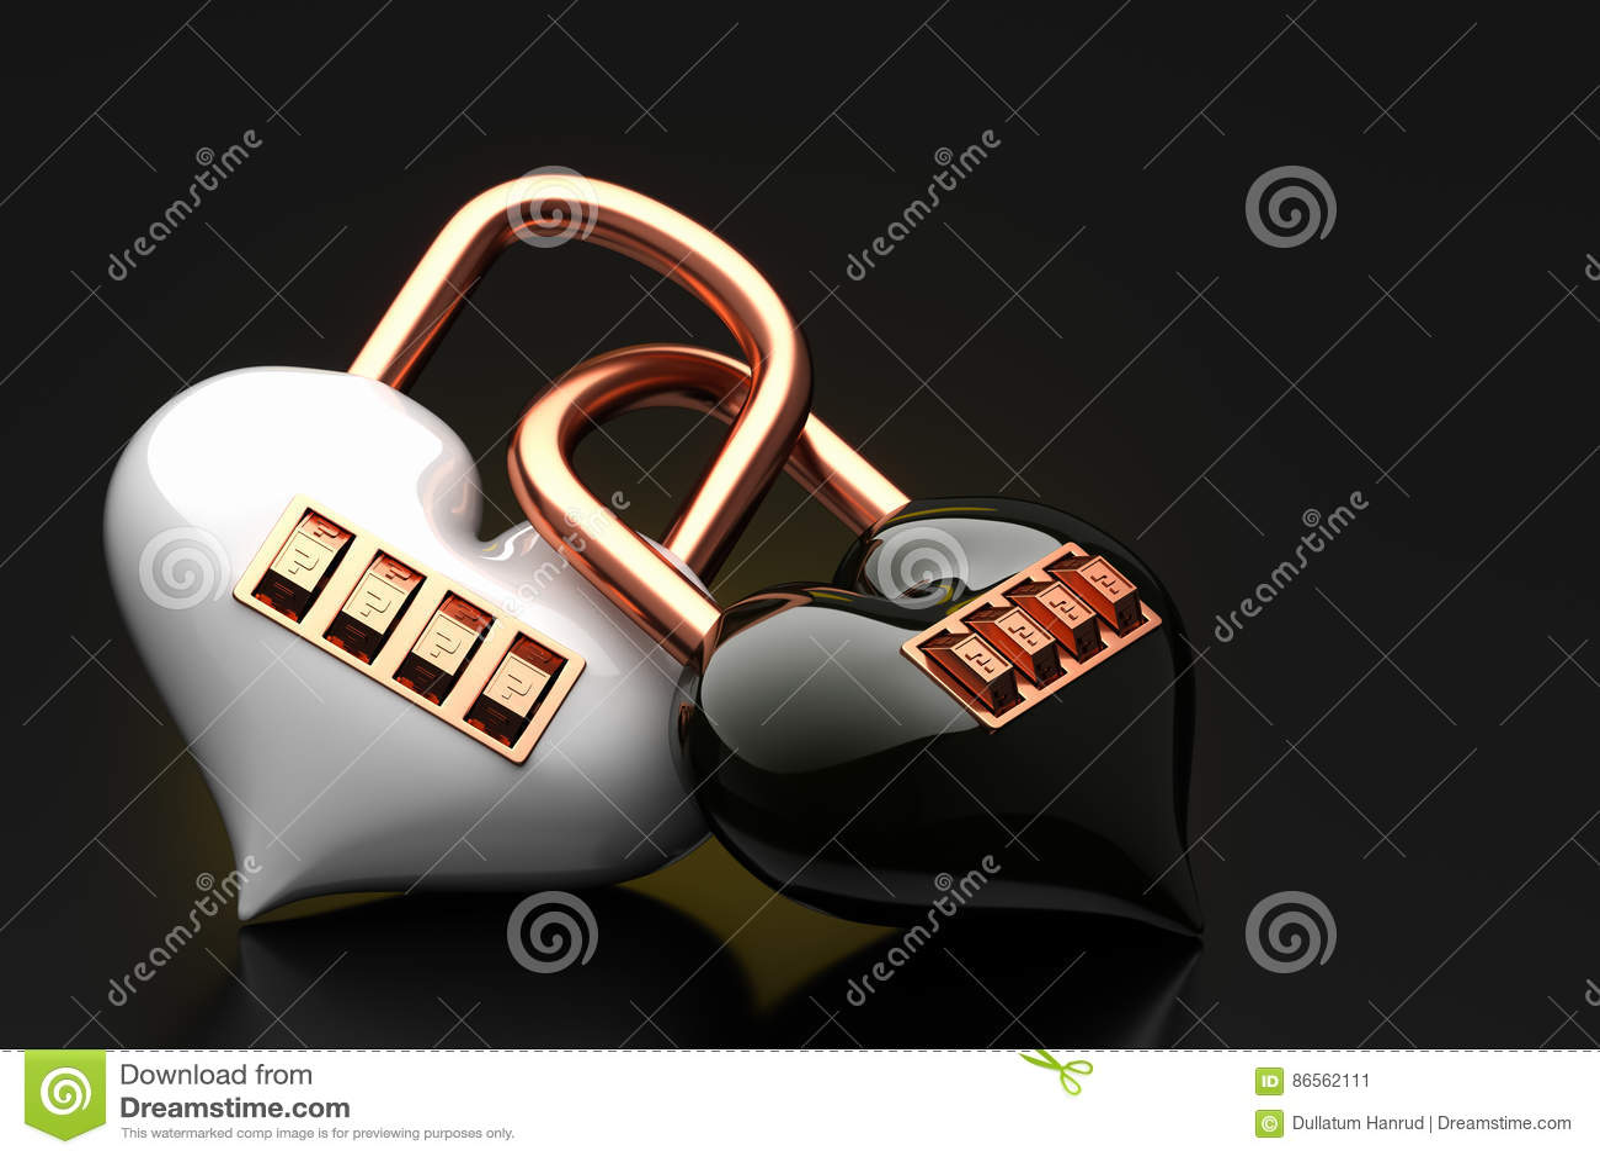 Loosen the lock code puzzle heart stock illustration loosen the lock code puzzle heart buycottarizona Choice Image